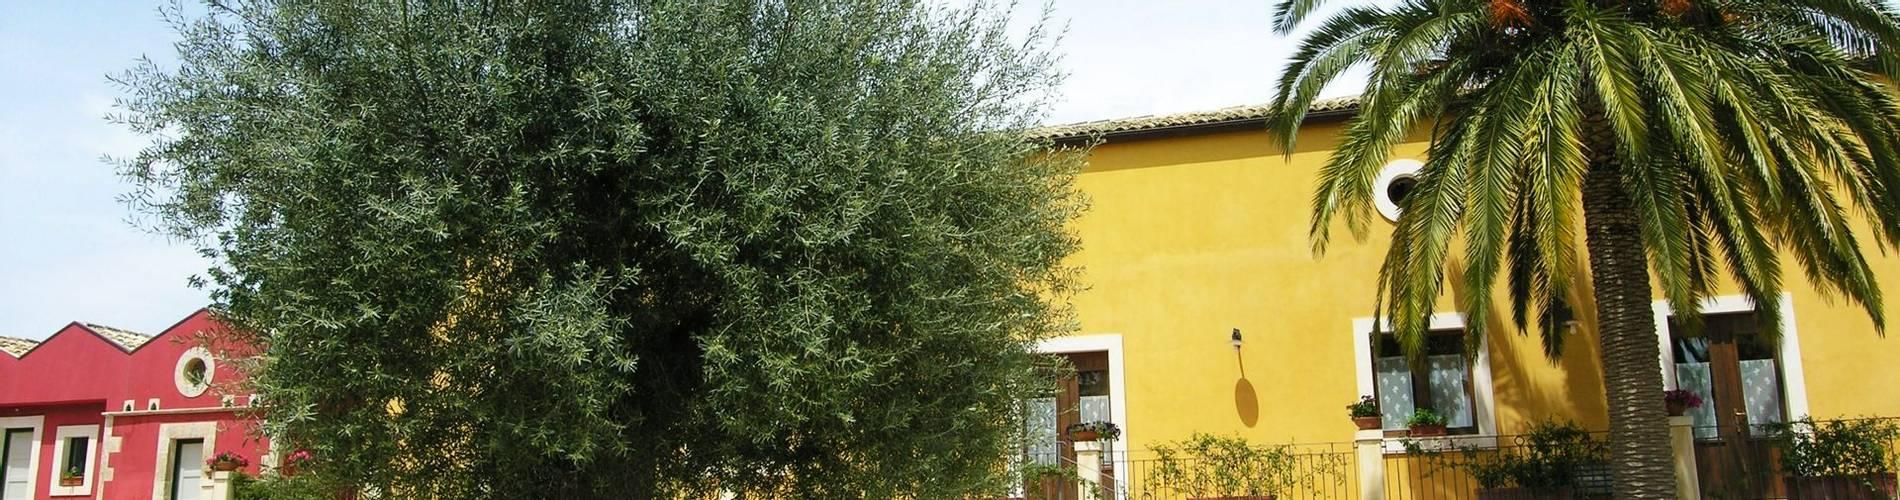 Il Paesino, Sicily, Italy (7).jpg